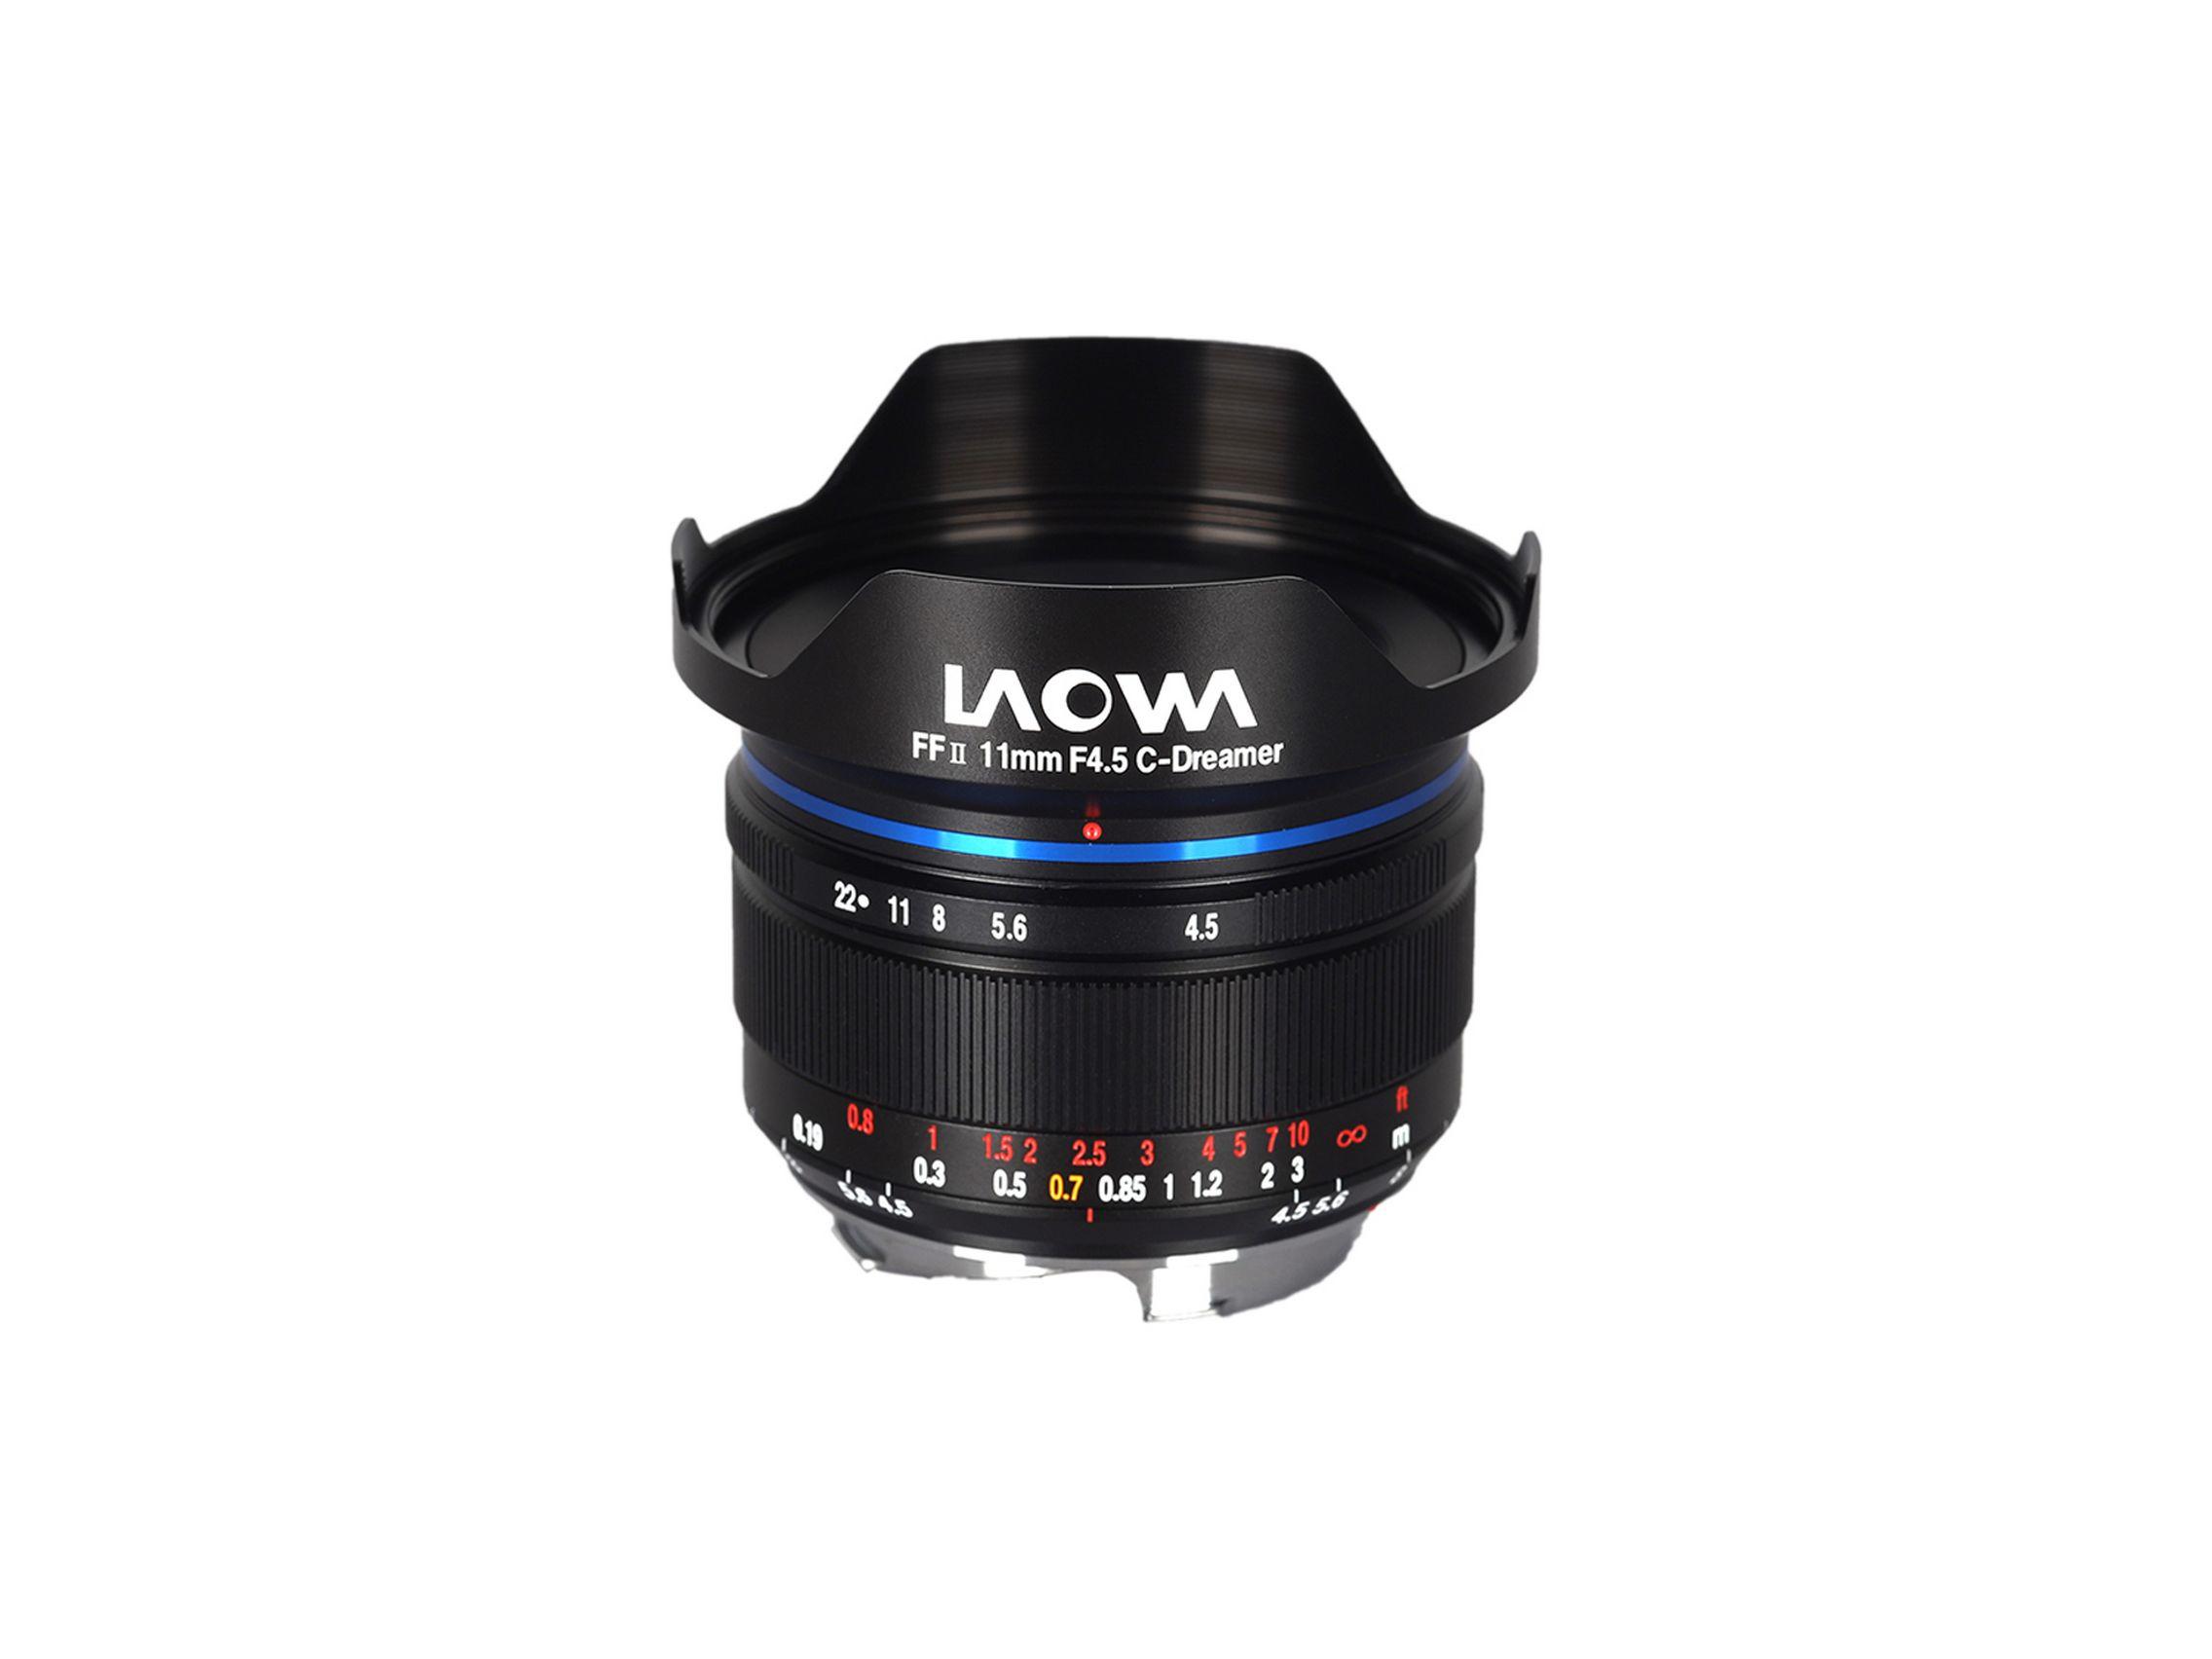 Laowa FF II 11mm F4.5 C-Dreamer RL